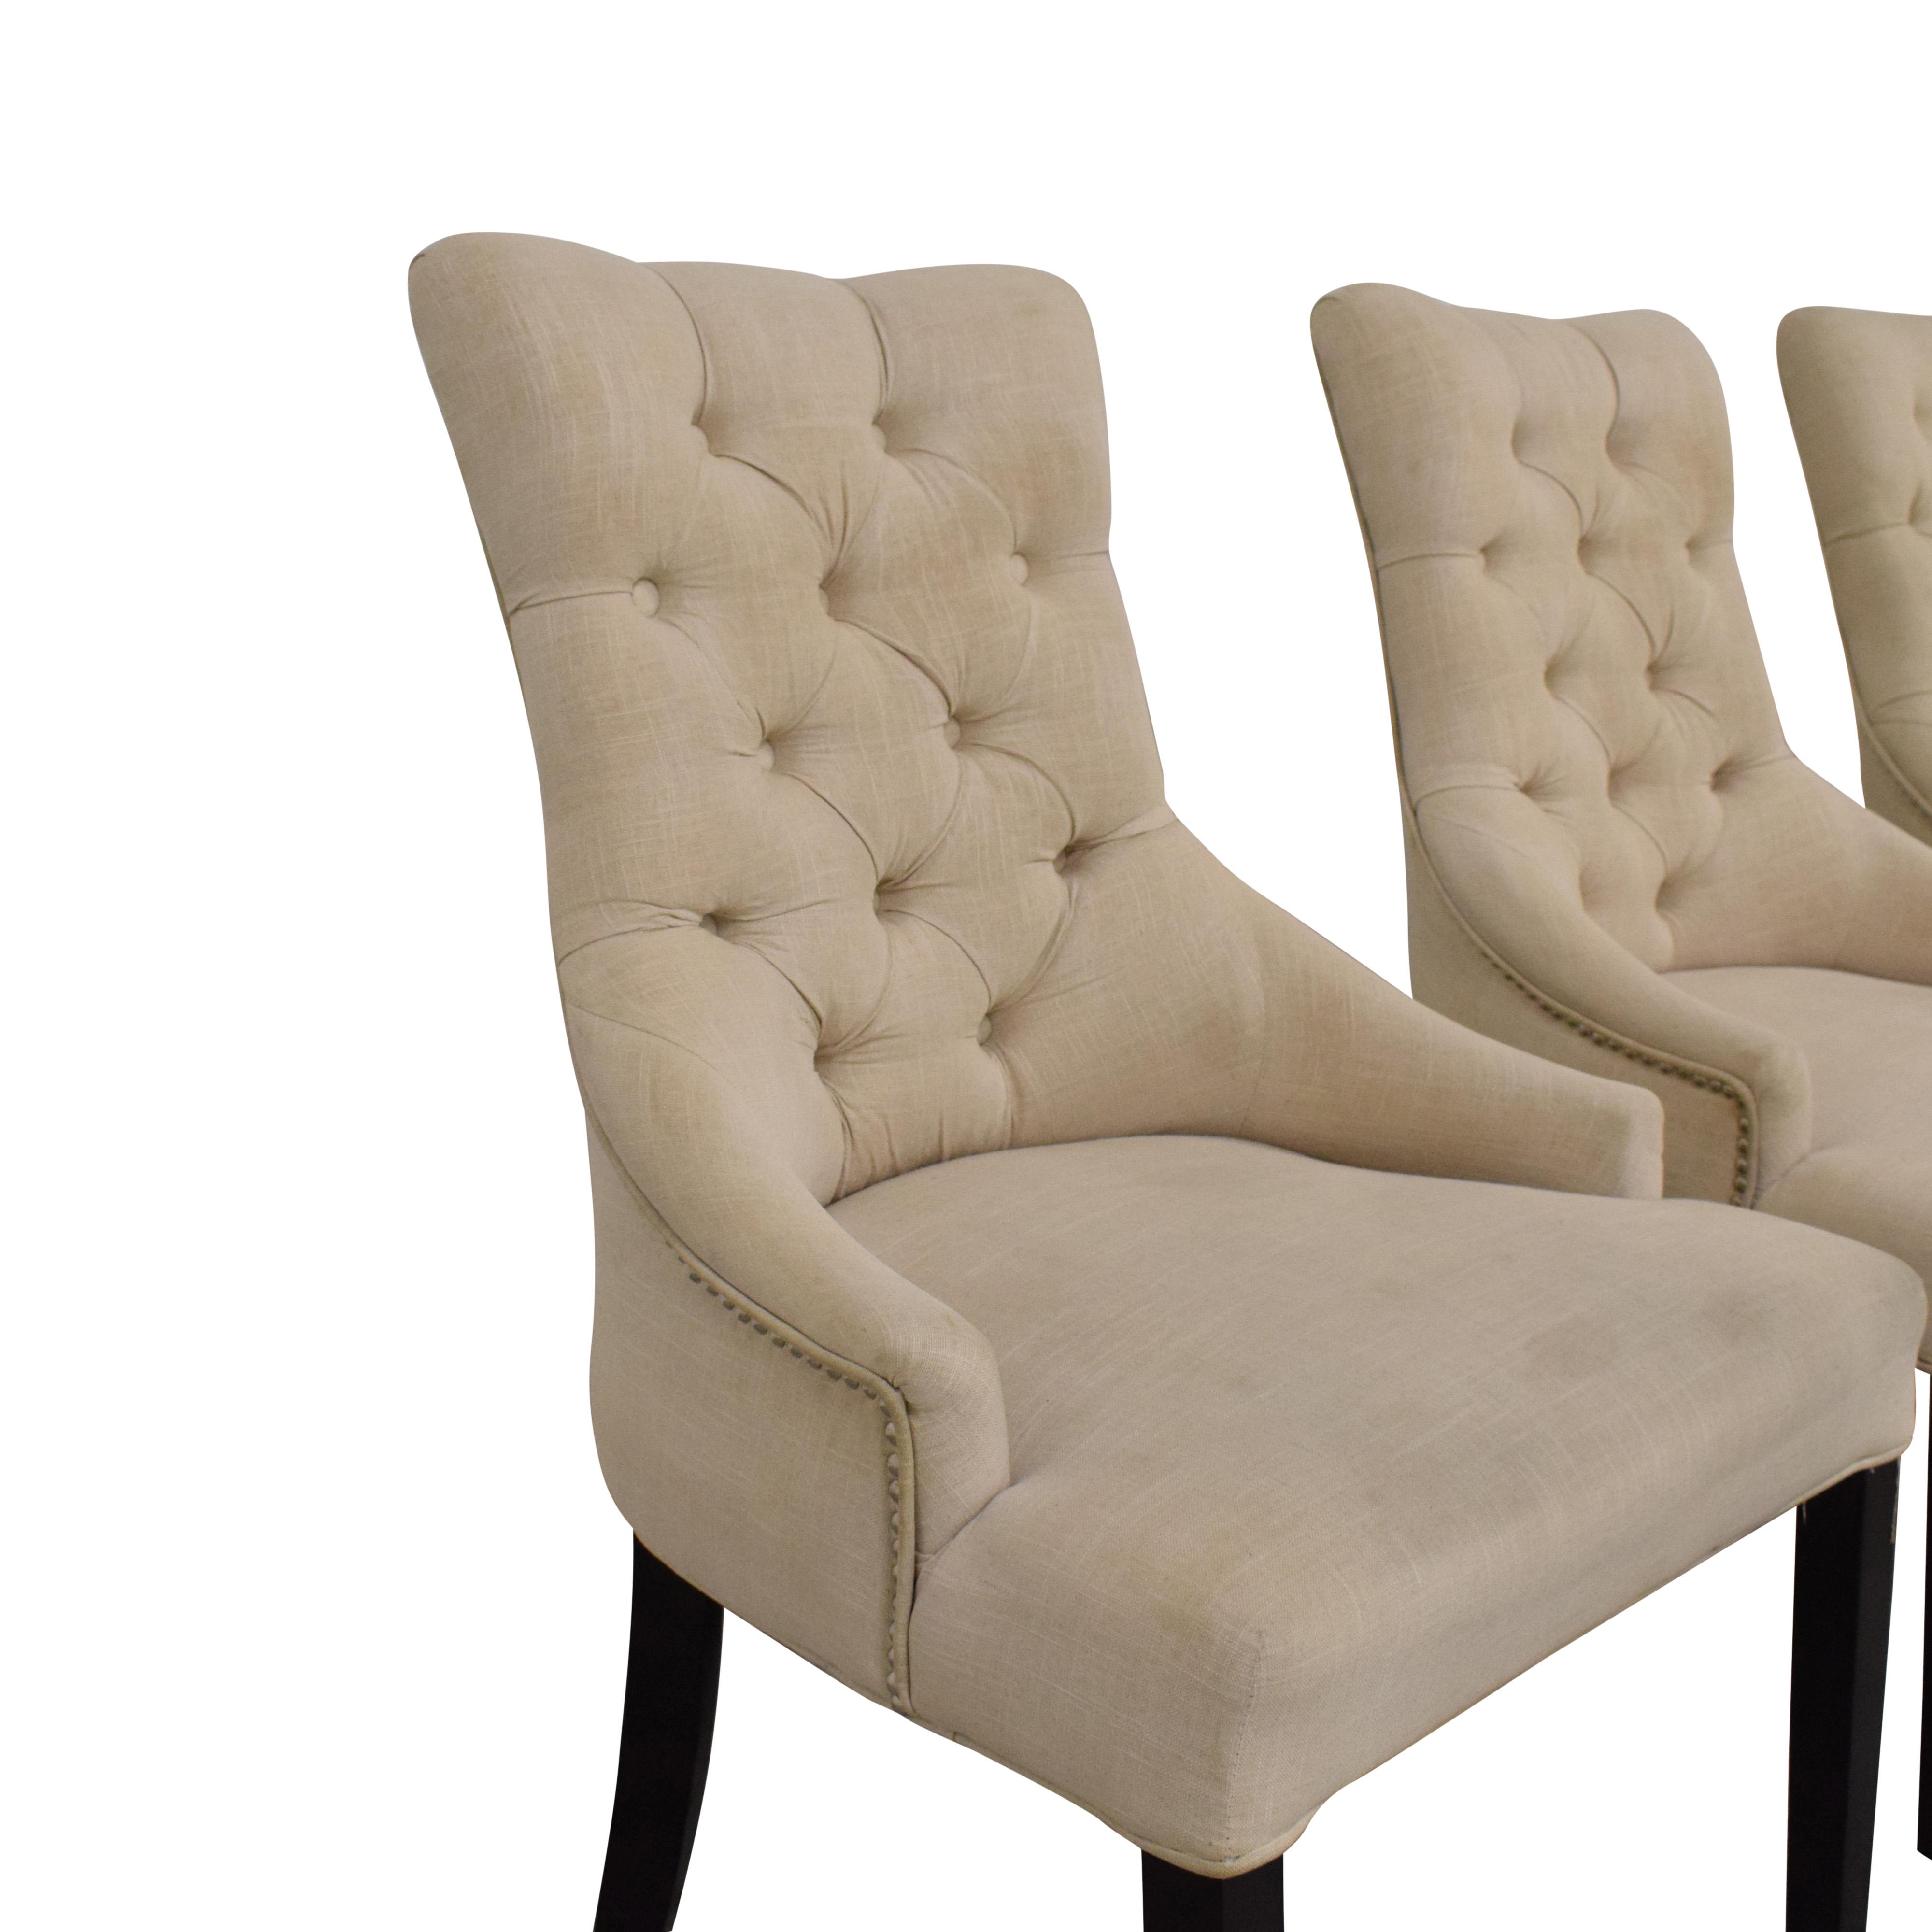 Macy's Macy's Marais Dining Parsons Chairs Chairs